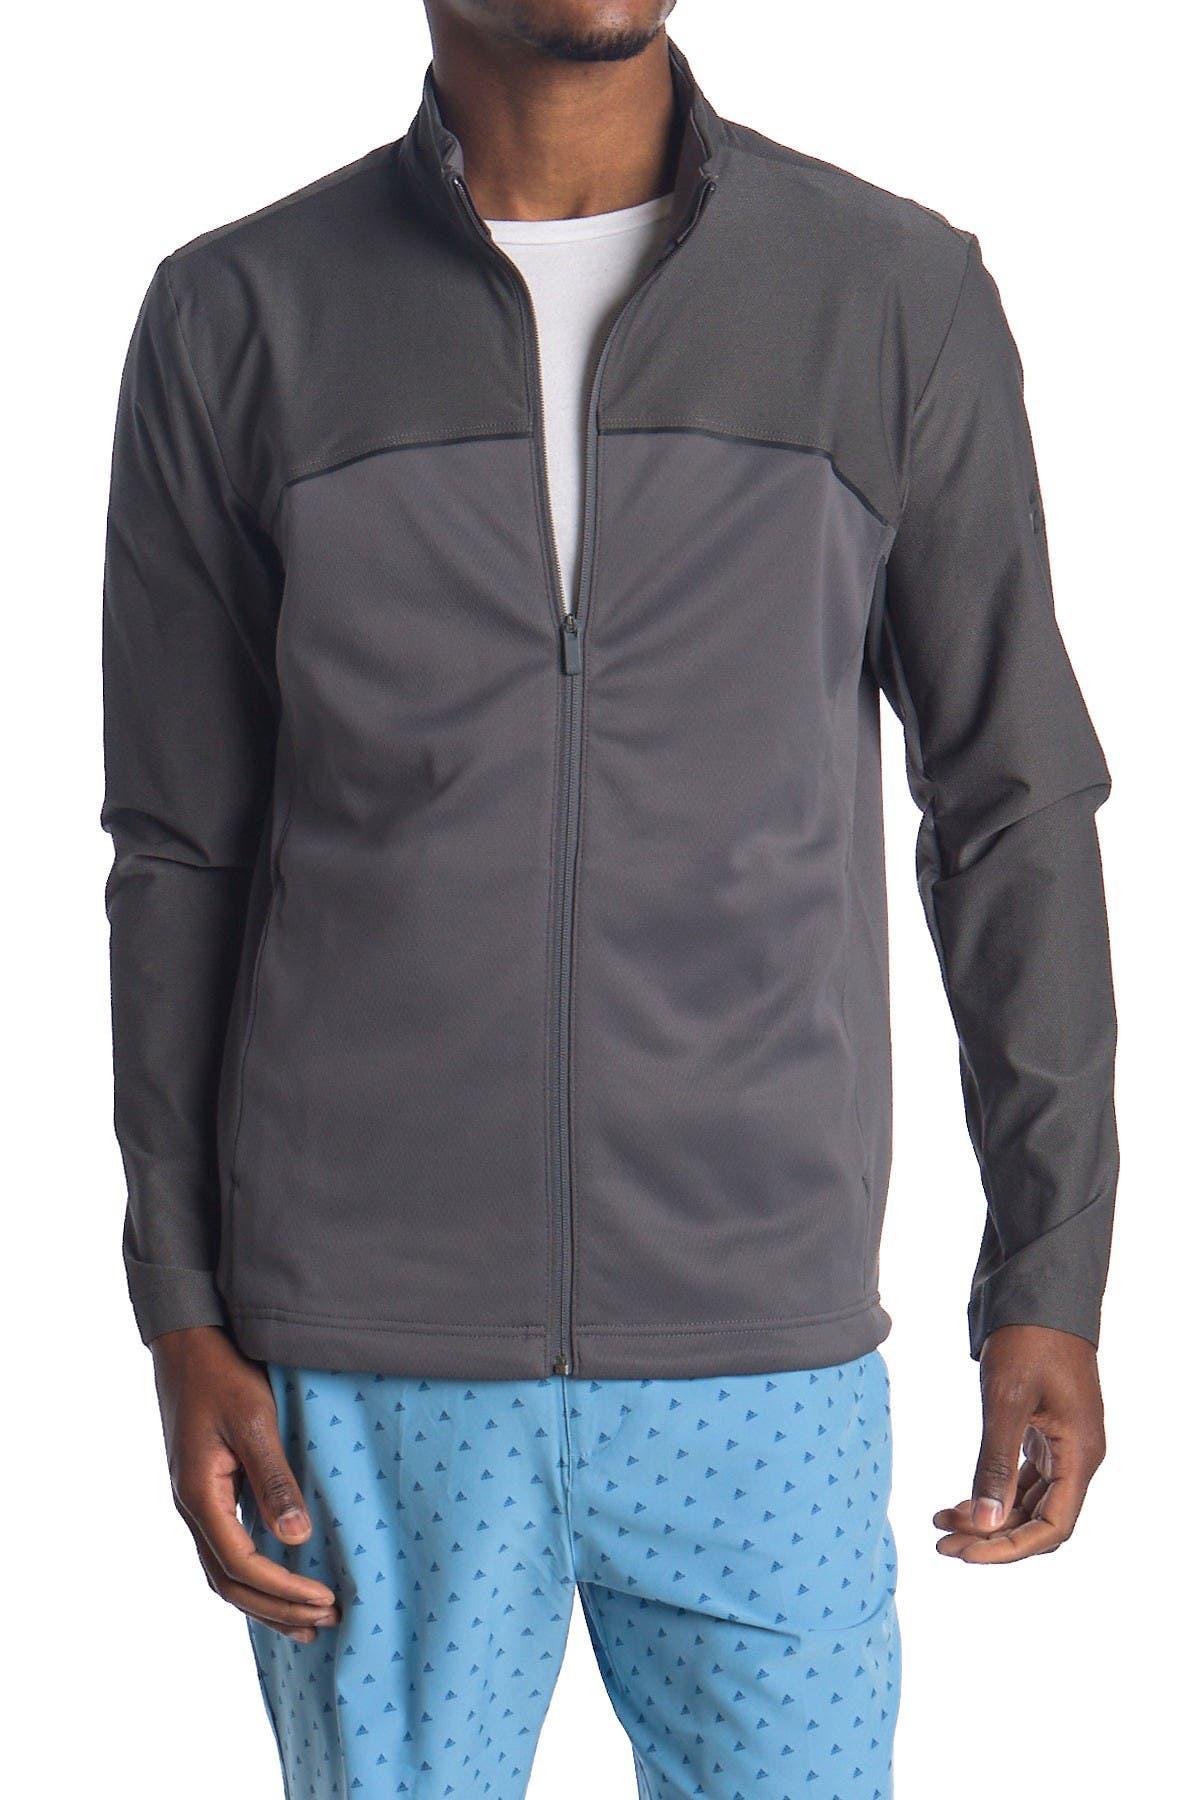 Adidas Go-To Zip Up Golf Jacket